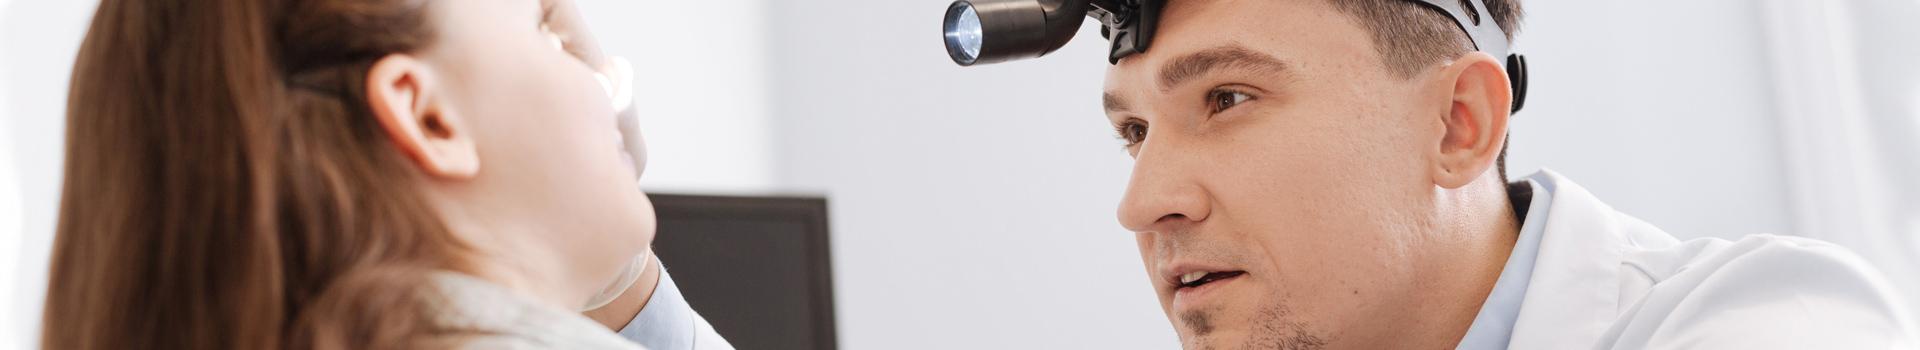 Serviço de Residência Médica de Otorrinolaringologia